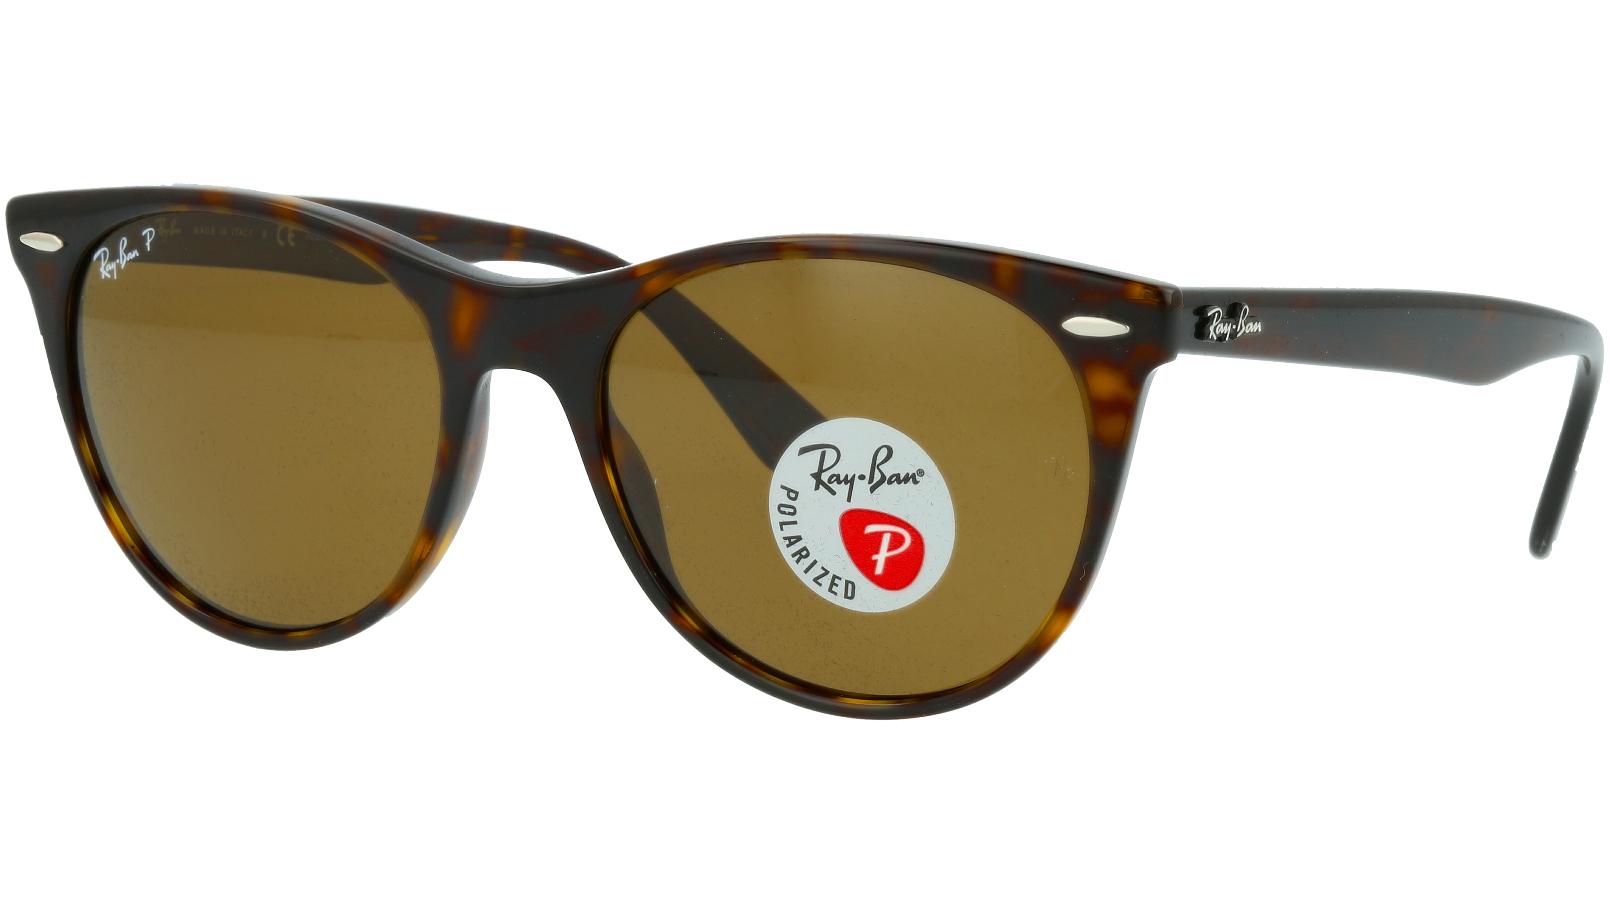 Ray-Ban RB2185 902/57 55 TORTOISE Polarised Sunglasses